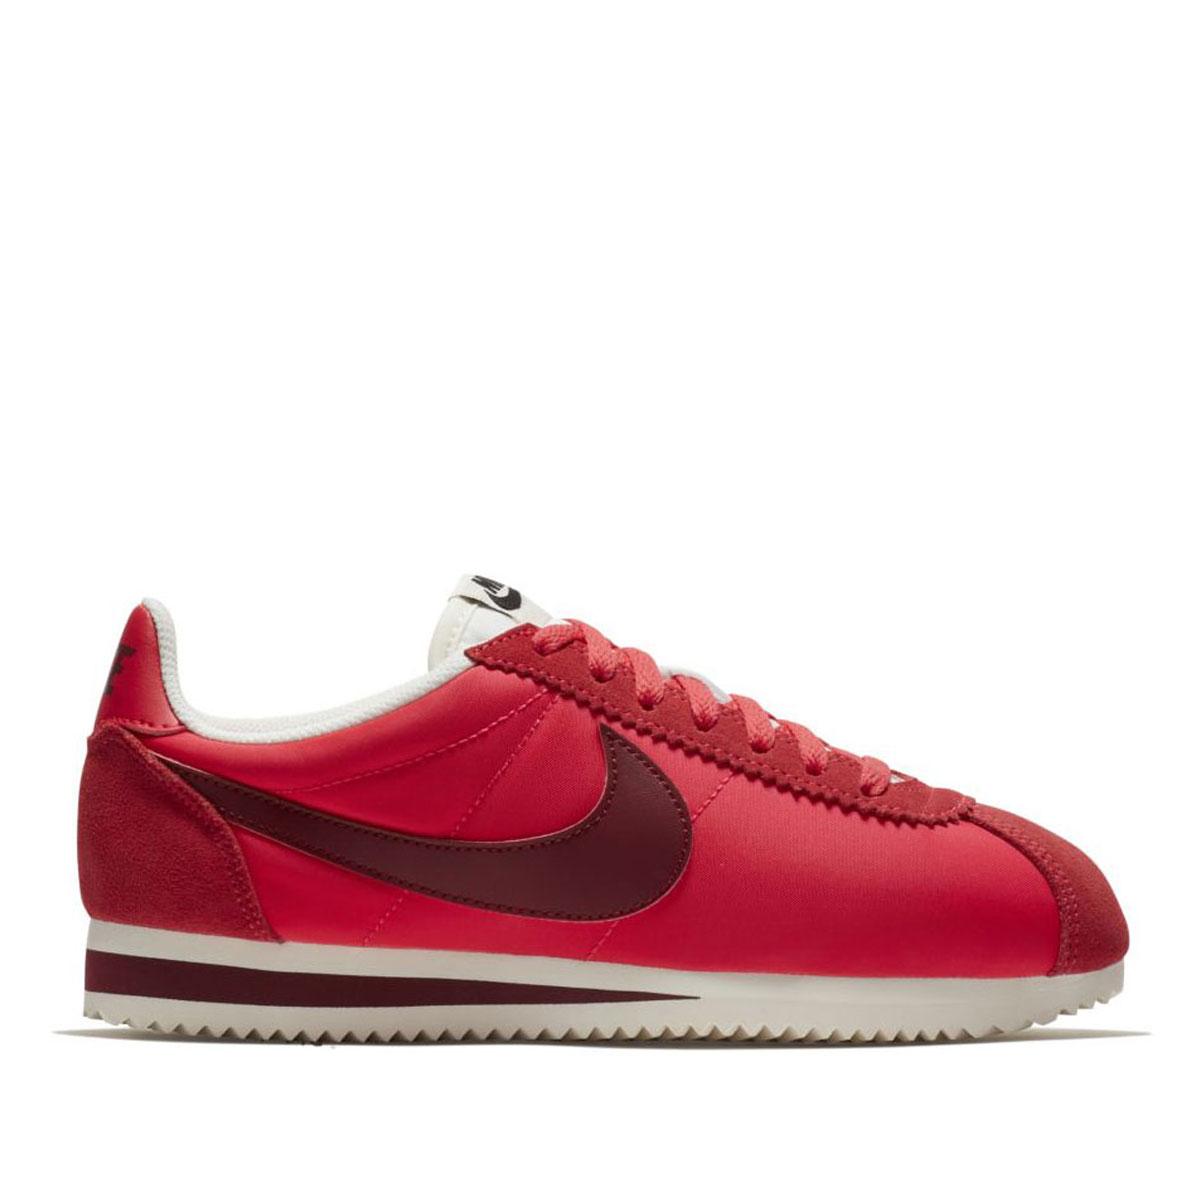 sports shoes f1c7f 7110c NIKE WMNS CLASSIC CORTEZ NYLON (ナイキウィメンズクラシックコルテッツナイロン) SIREN RED/TEAM  RED-SAIL 17FA-I